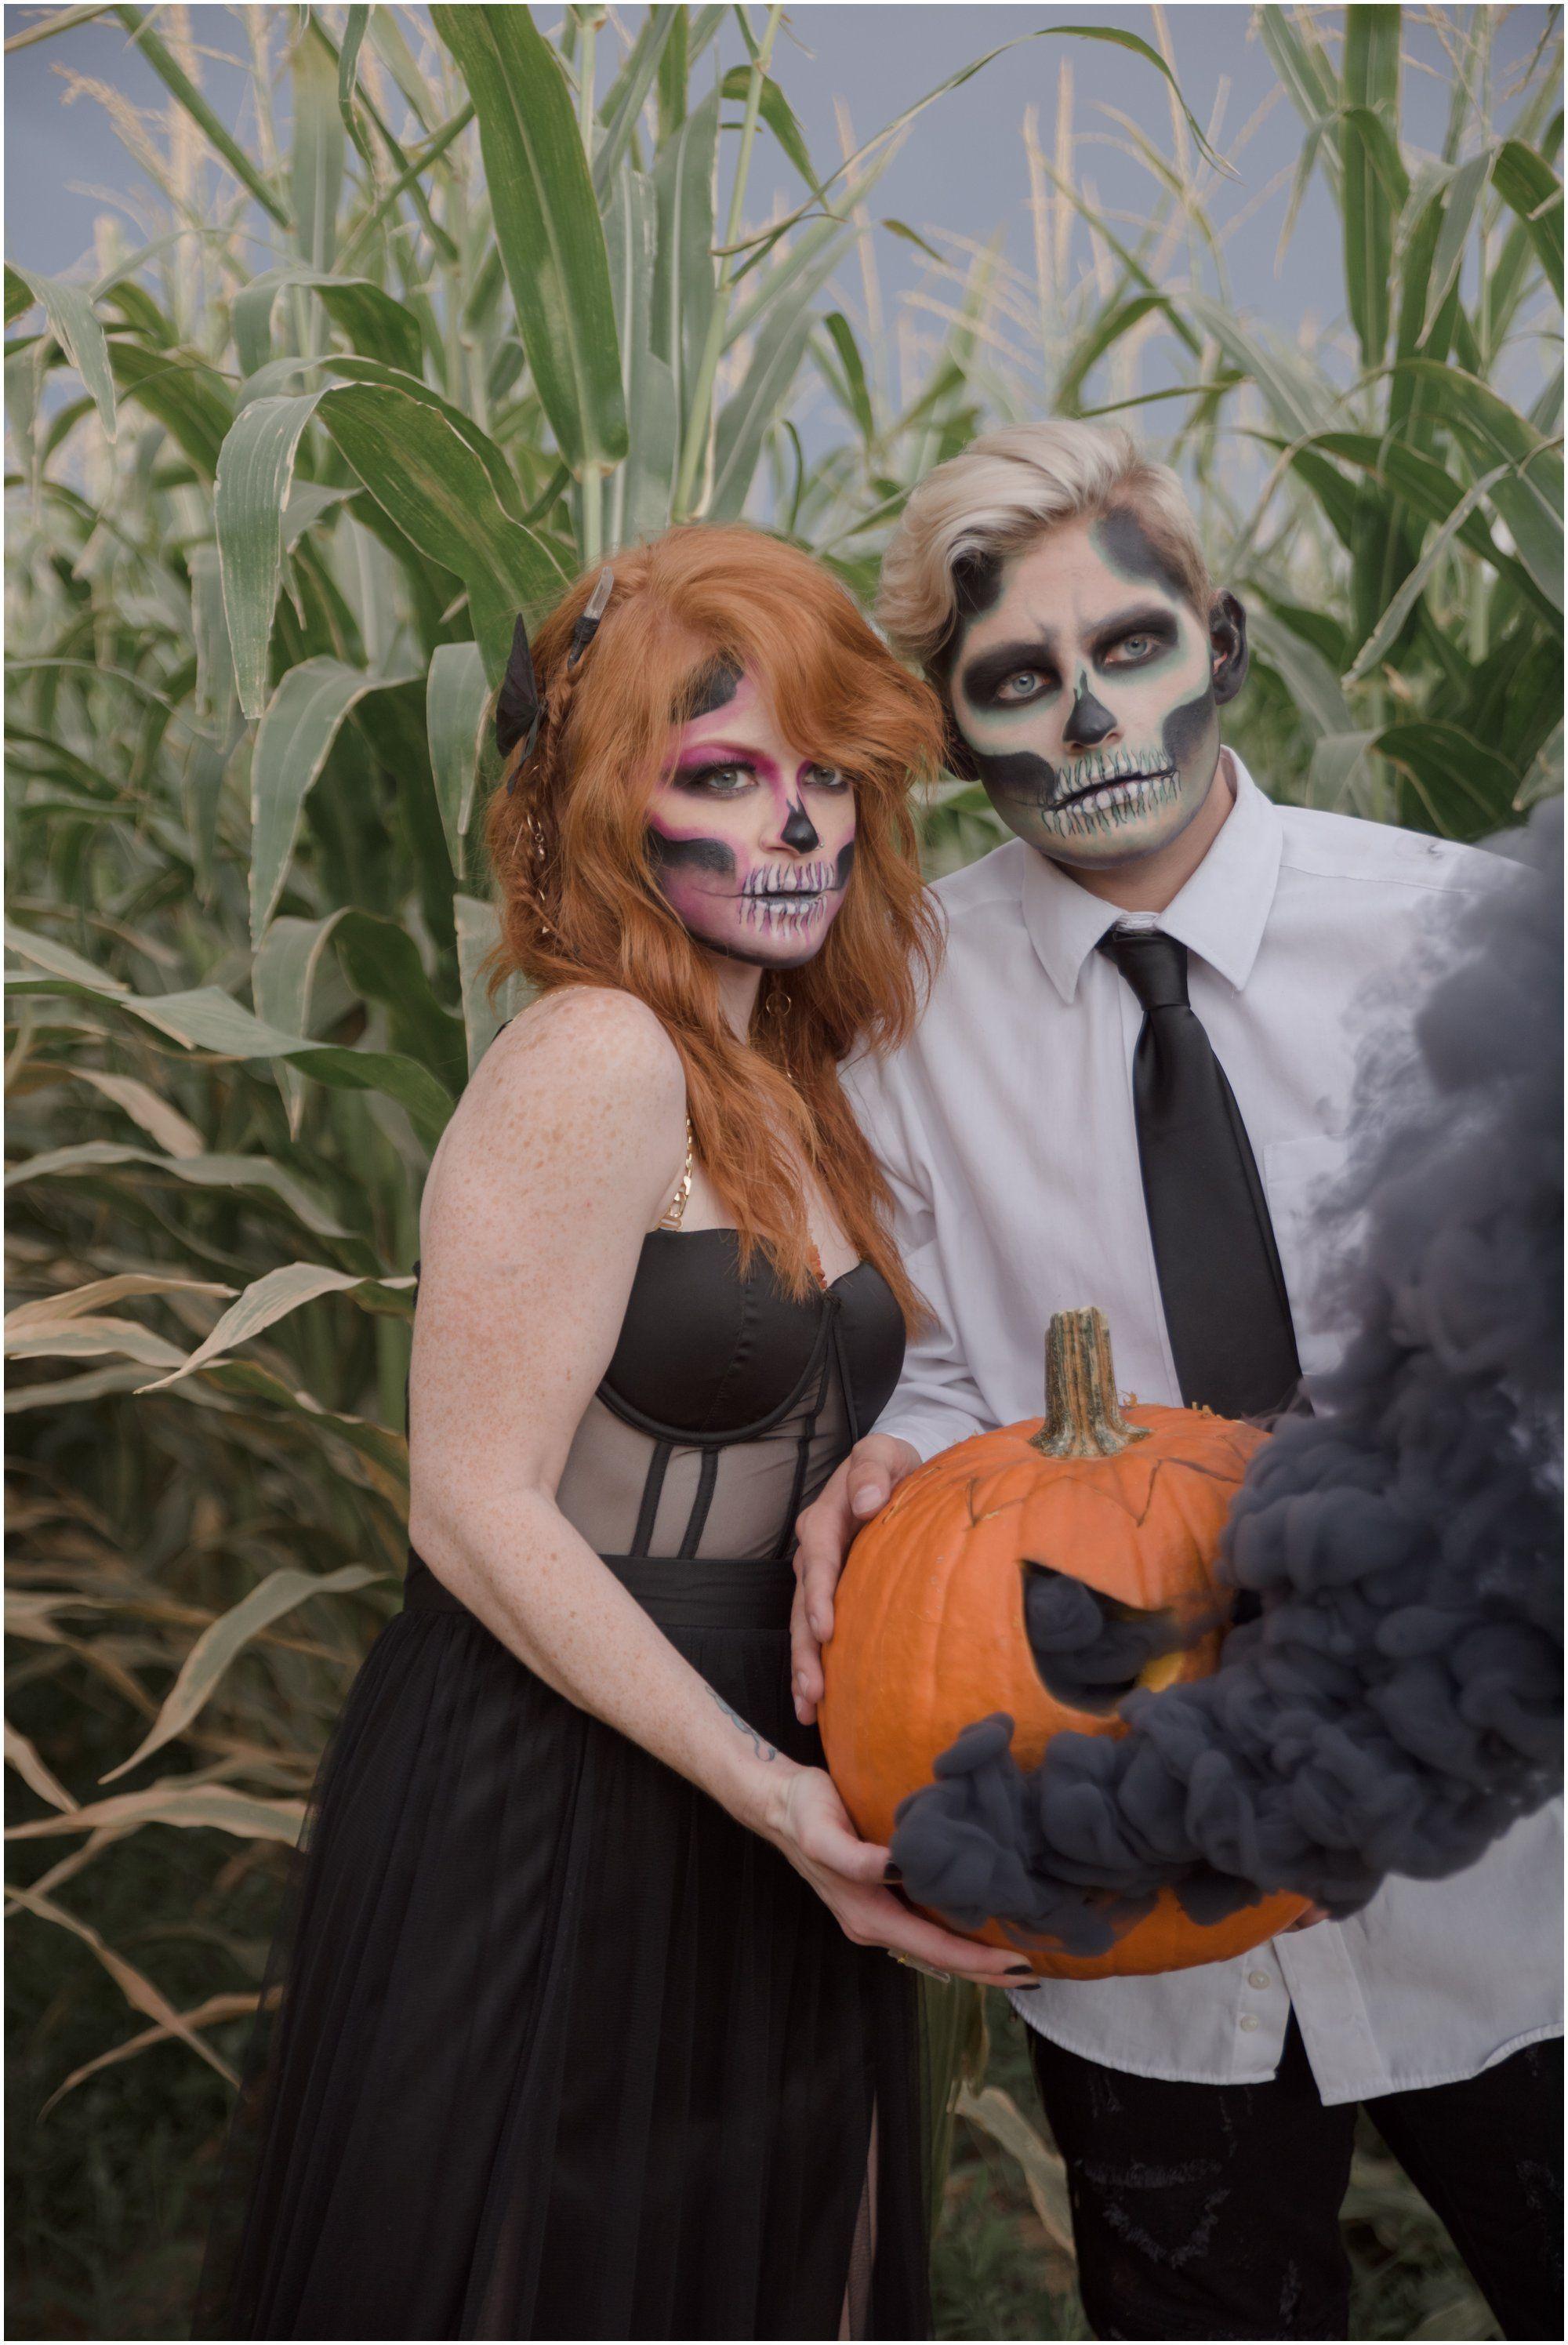 Moapa Valley Corn Maze Las Vegas Nevada Corn Maze Photoshoot Halloween Photo With Images Halloween Styled Shoot Las Vegas Wedding Photographers Halloween Photoshoot